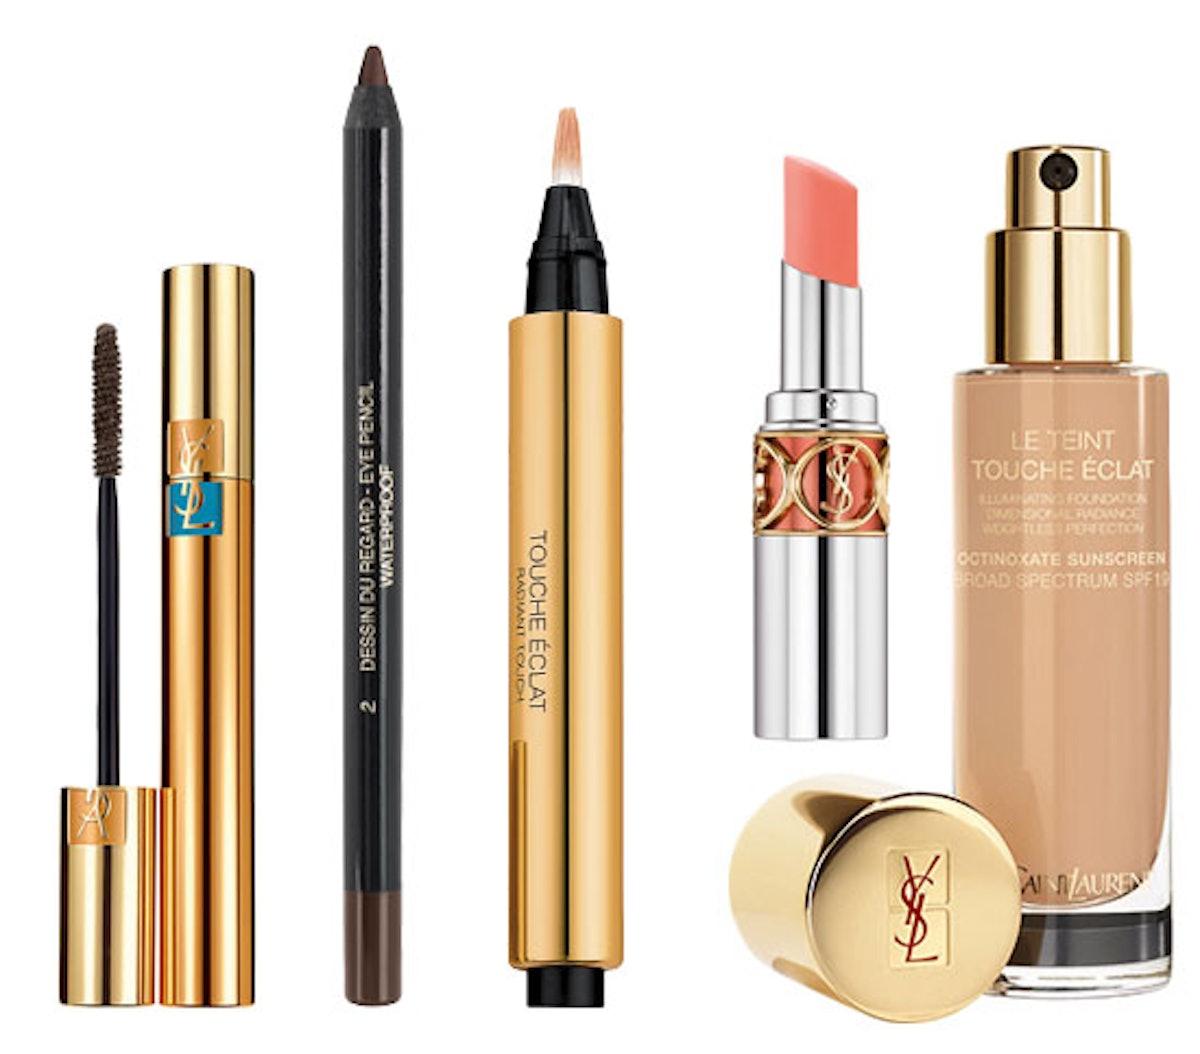 blog-ysl-bare-makeup-01.jpg